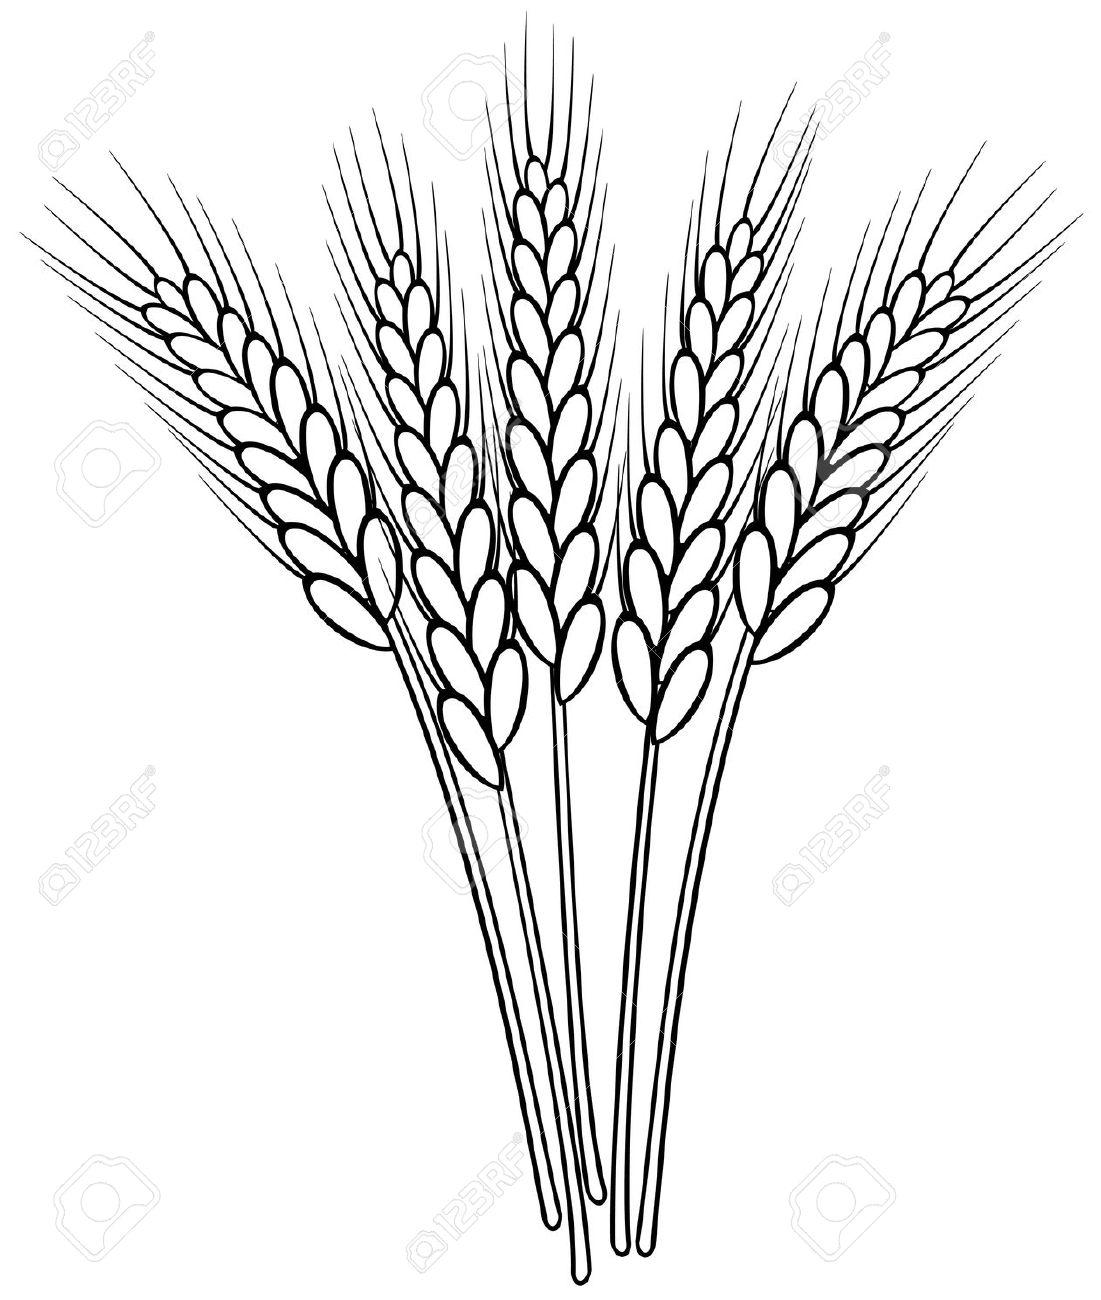 Drawn wheat Stalks white Google of small